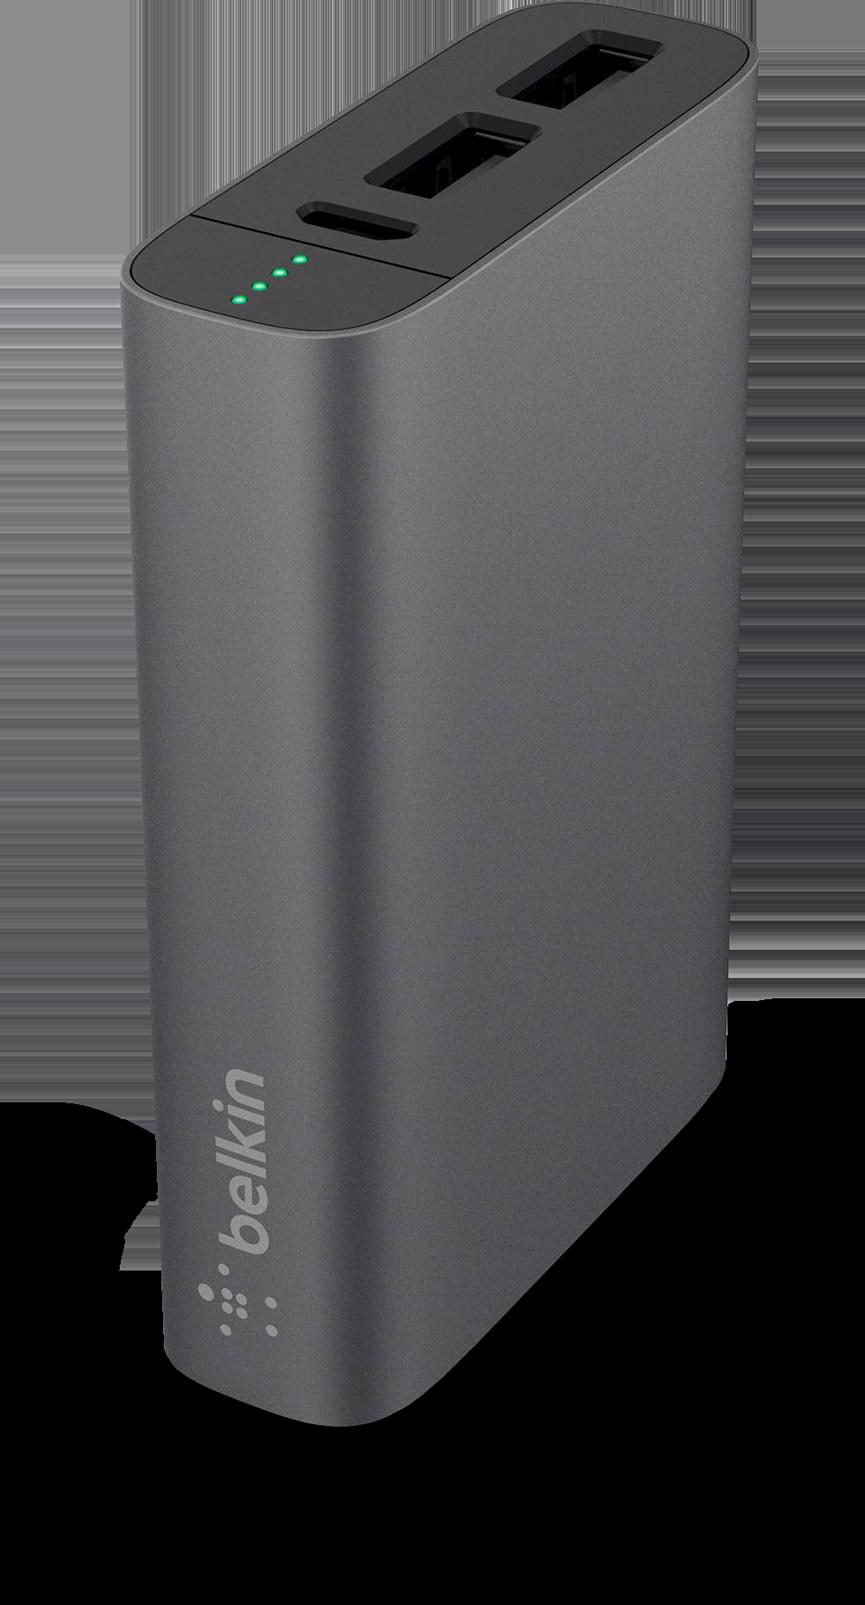 Belkin MIXIT Metallic Power Pack 6600 - side view